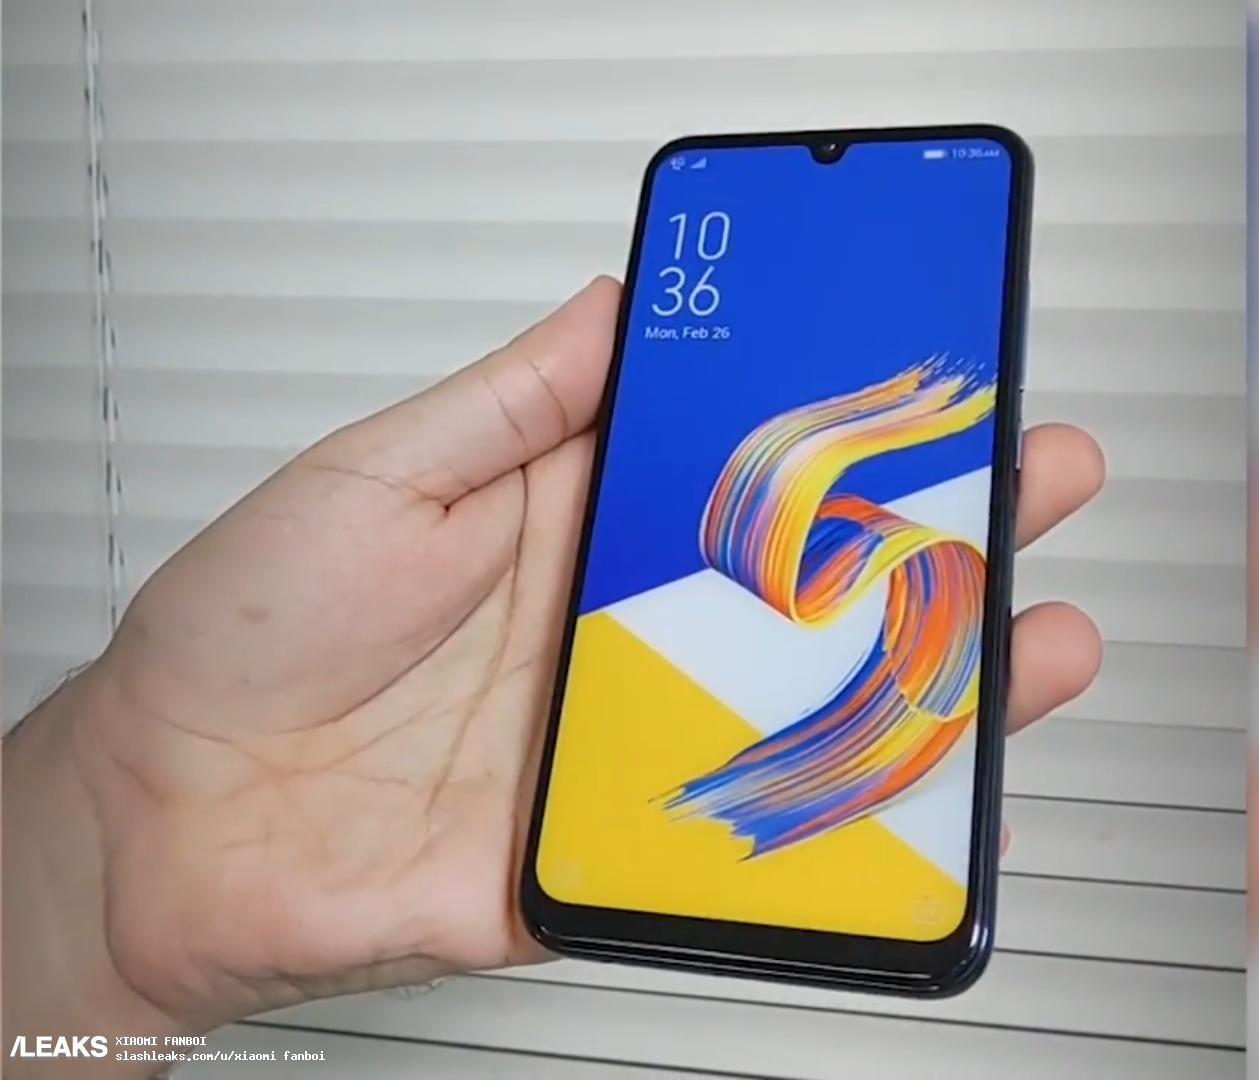 img Asus Zenfone 6 prototypes images leaked